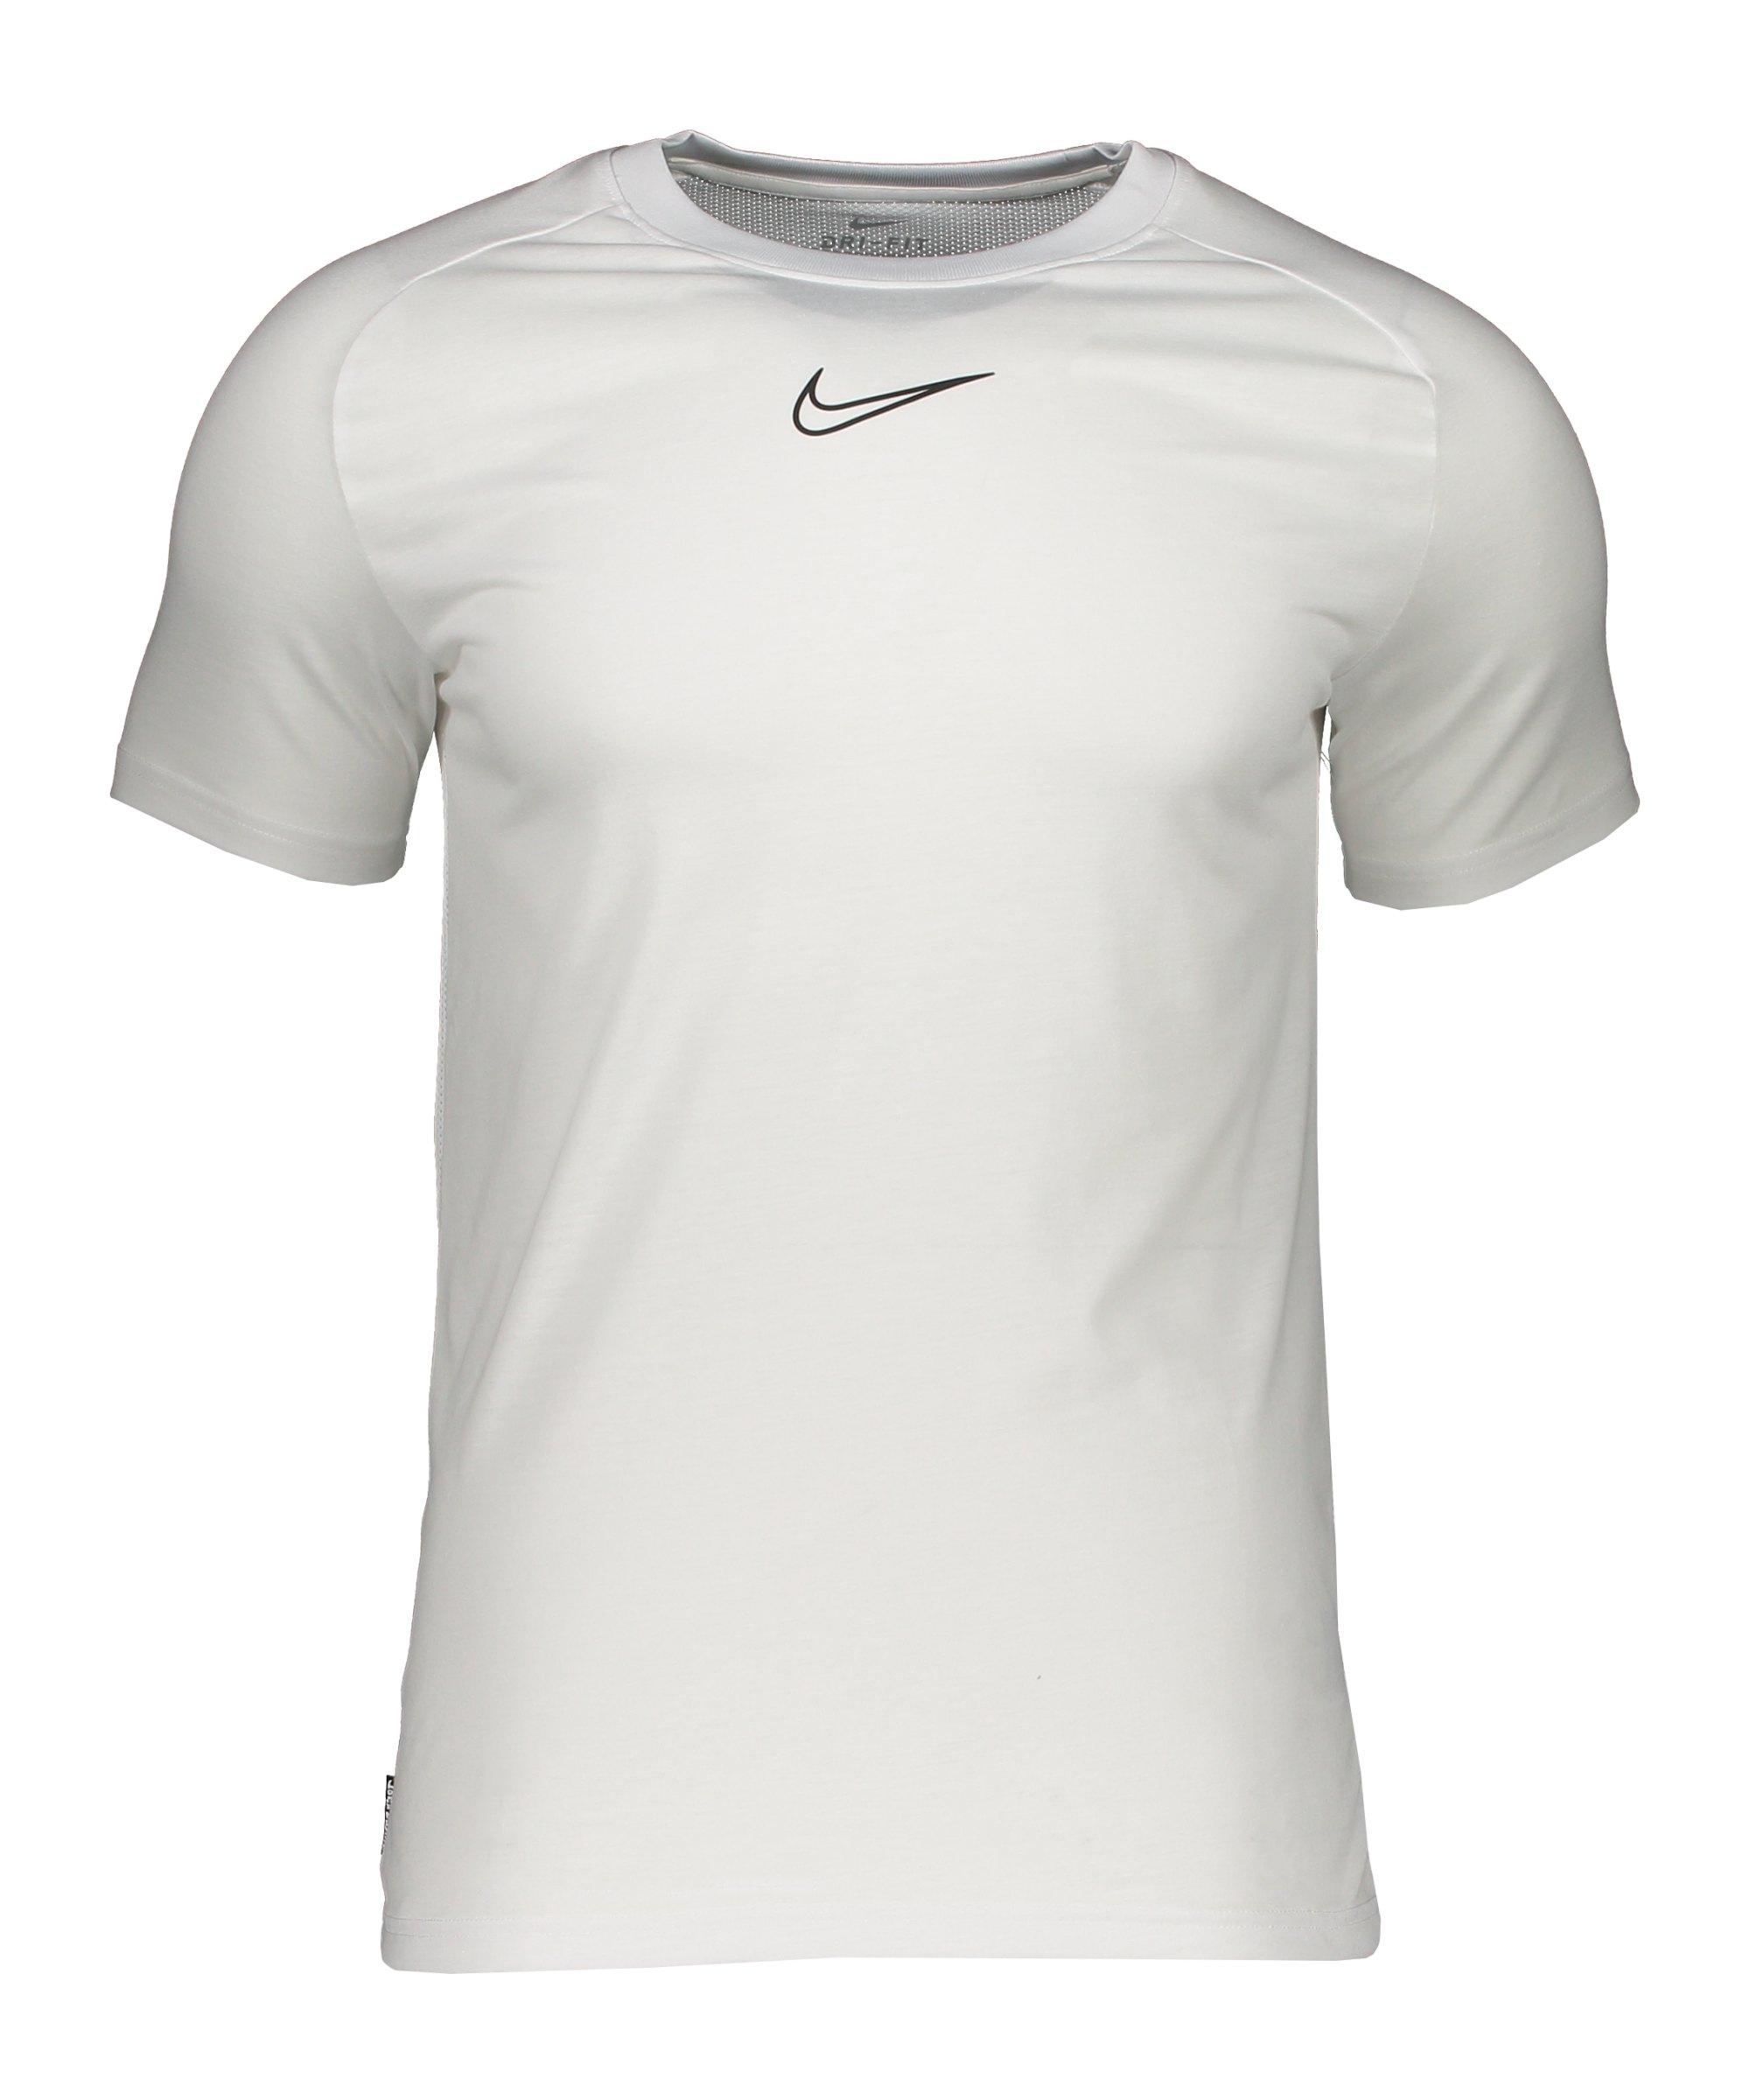 Nike Academy Dri-FIT T-Shirt Joga Bonito F100 - weiss